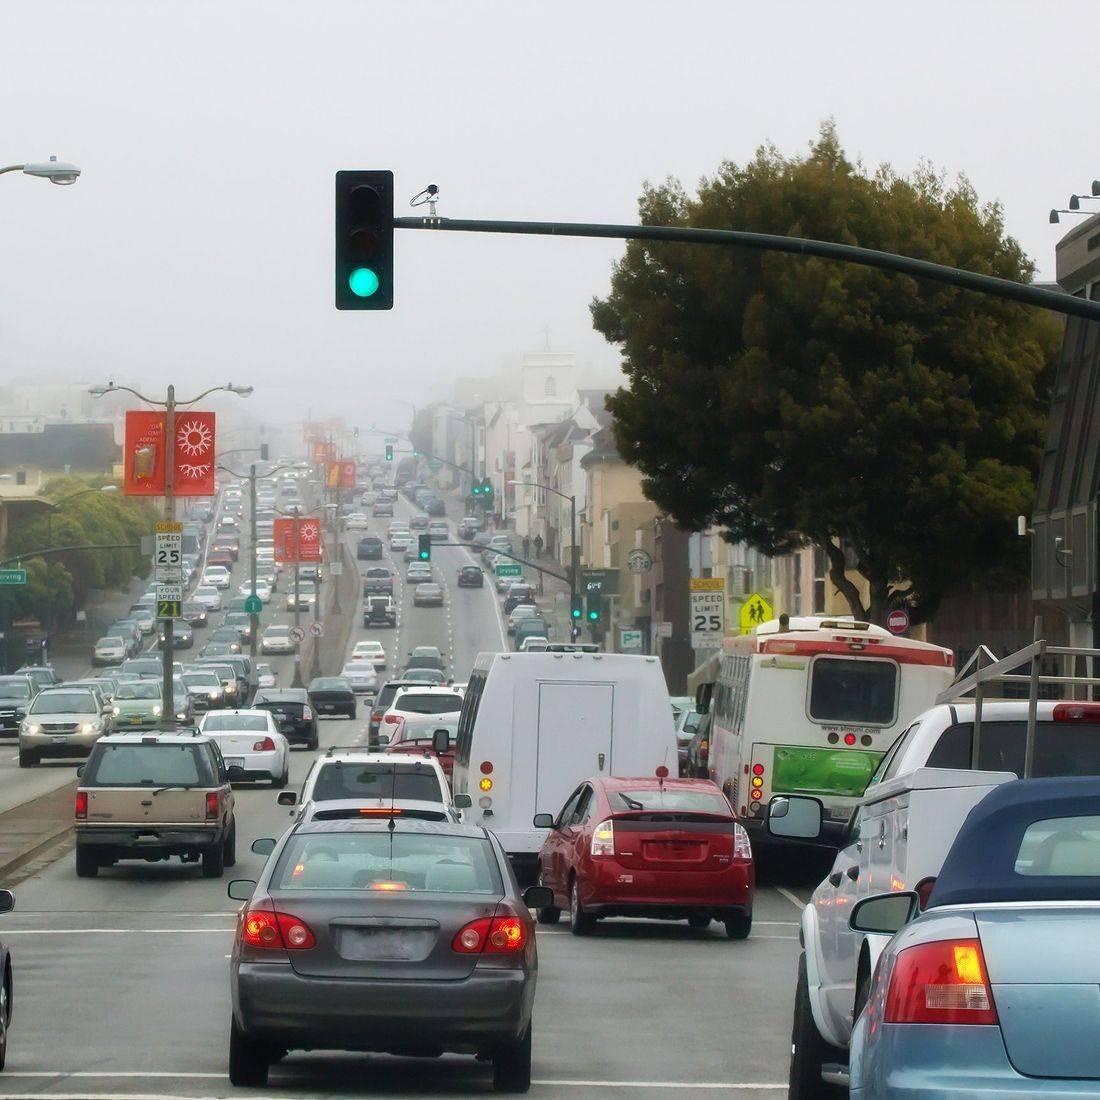 car insurance, traffic, accident, wreck, deer, glass